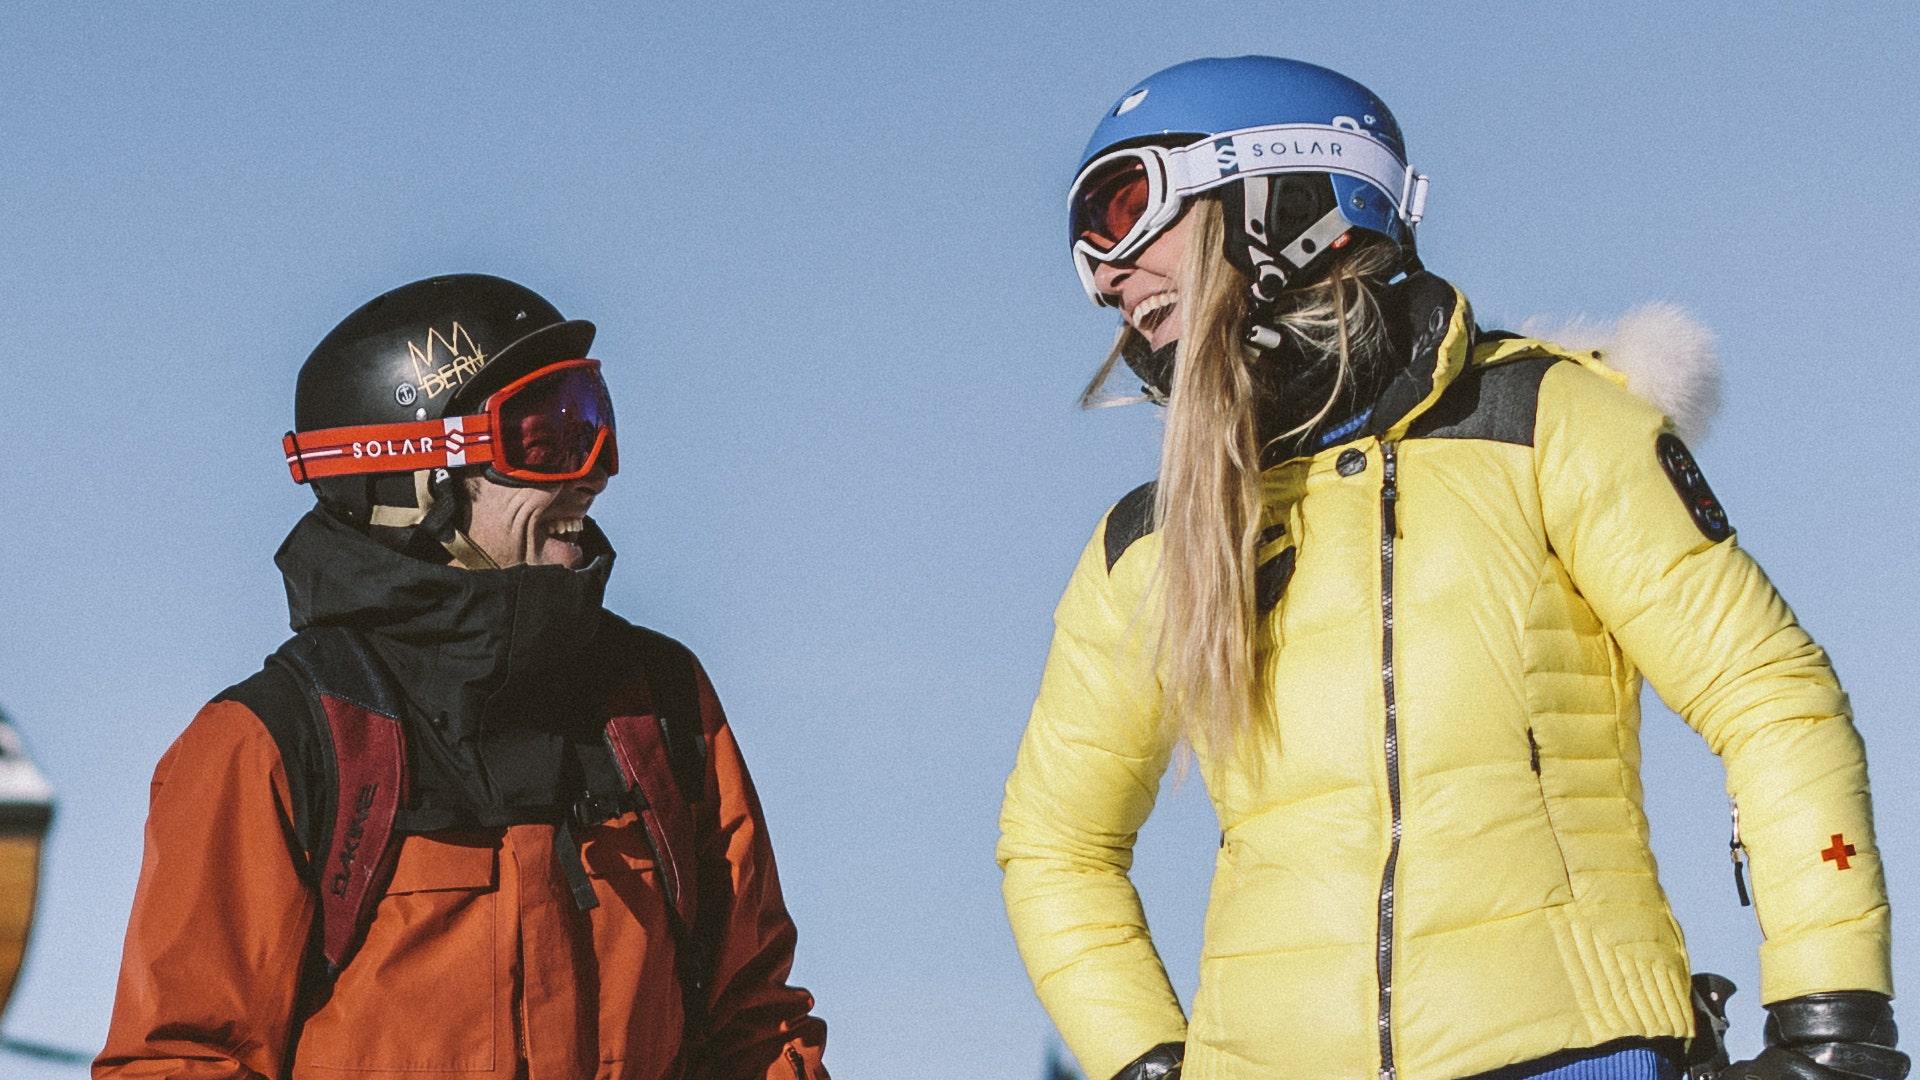 Goggles, ski, snowboard, men, women, winter